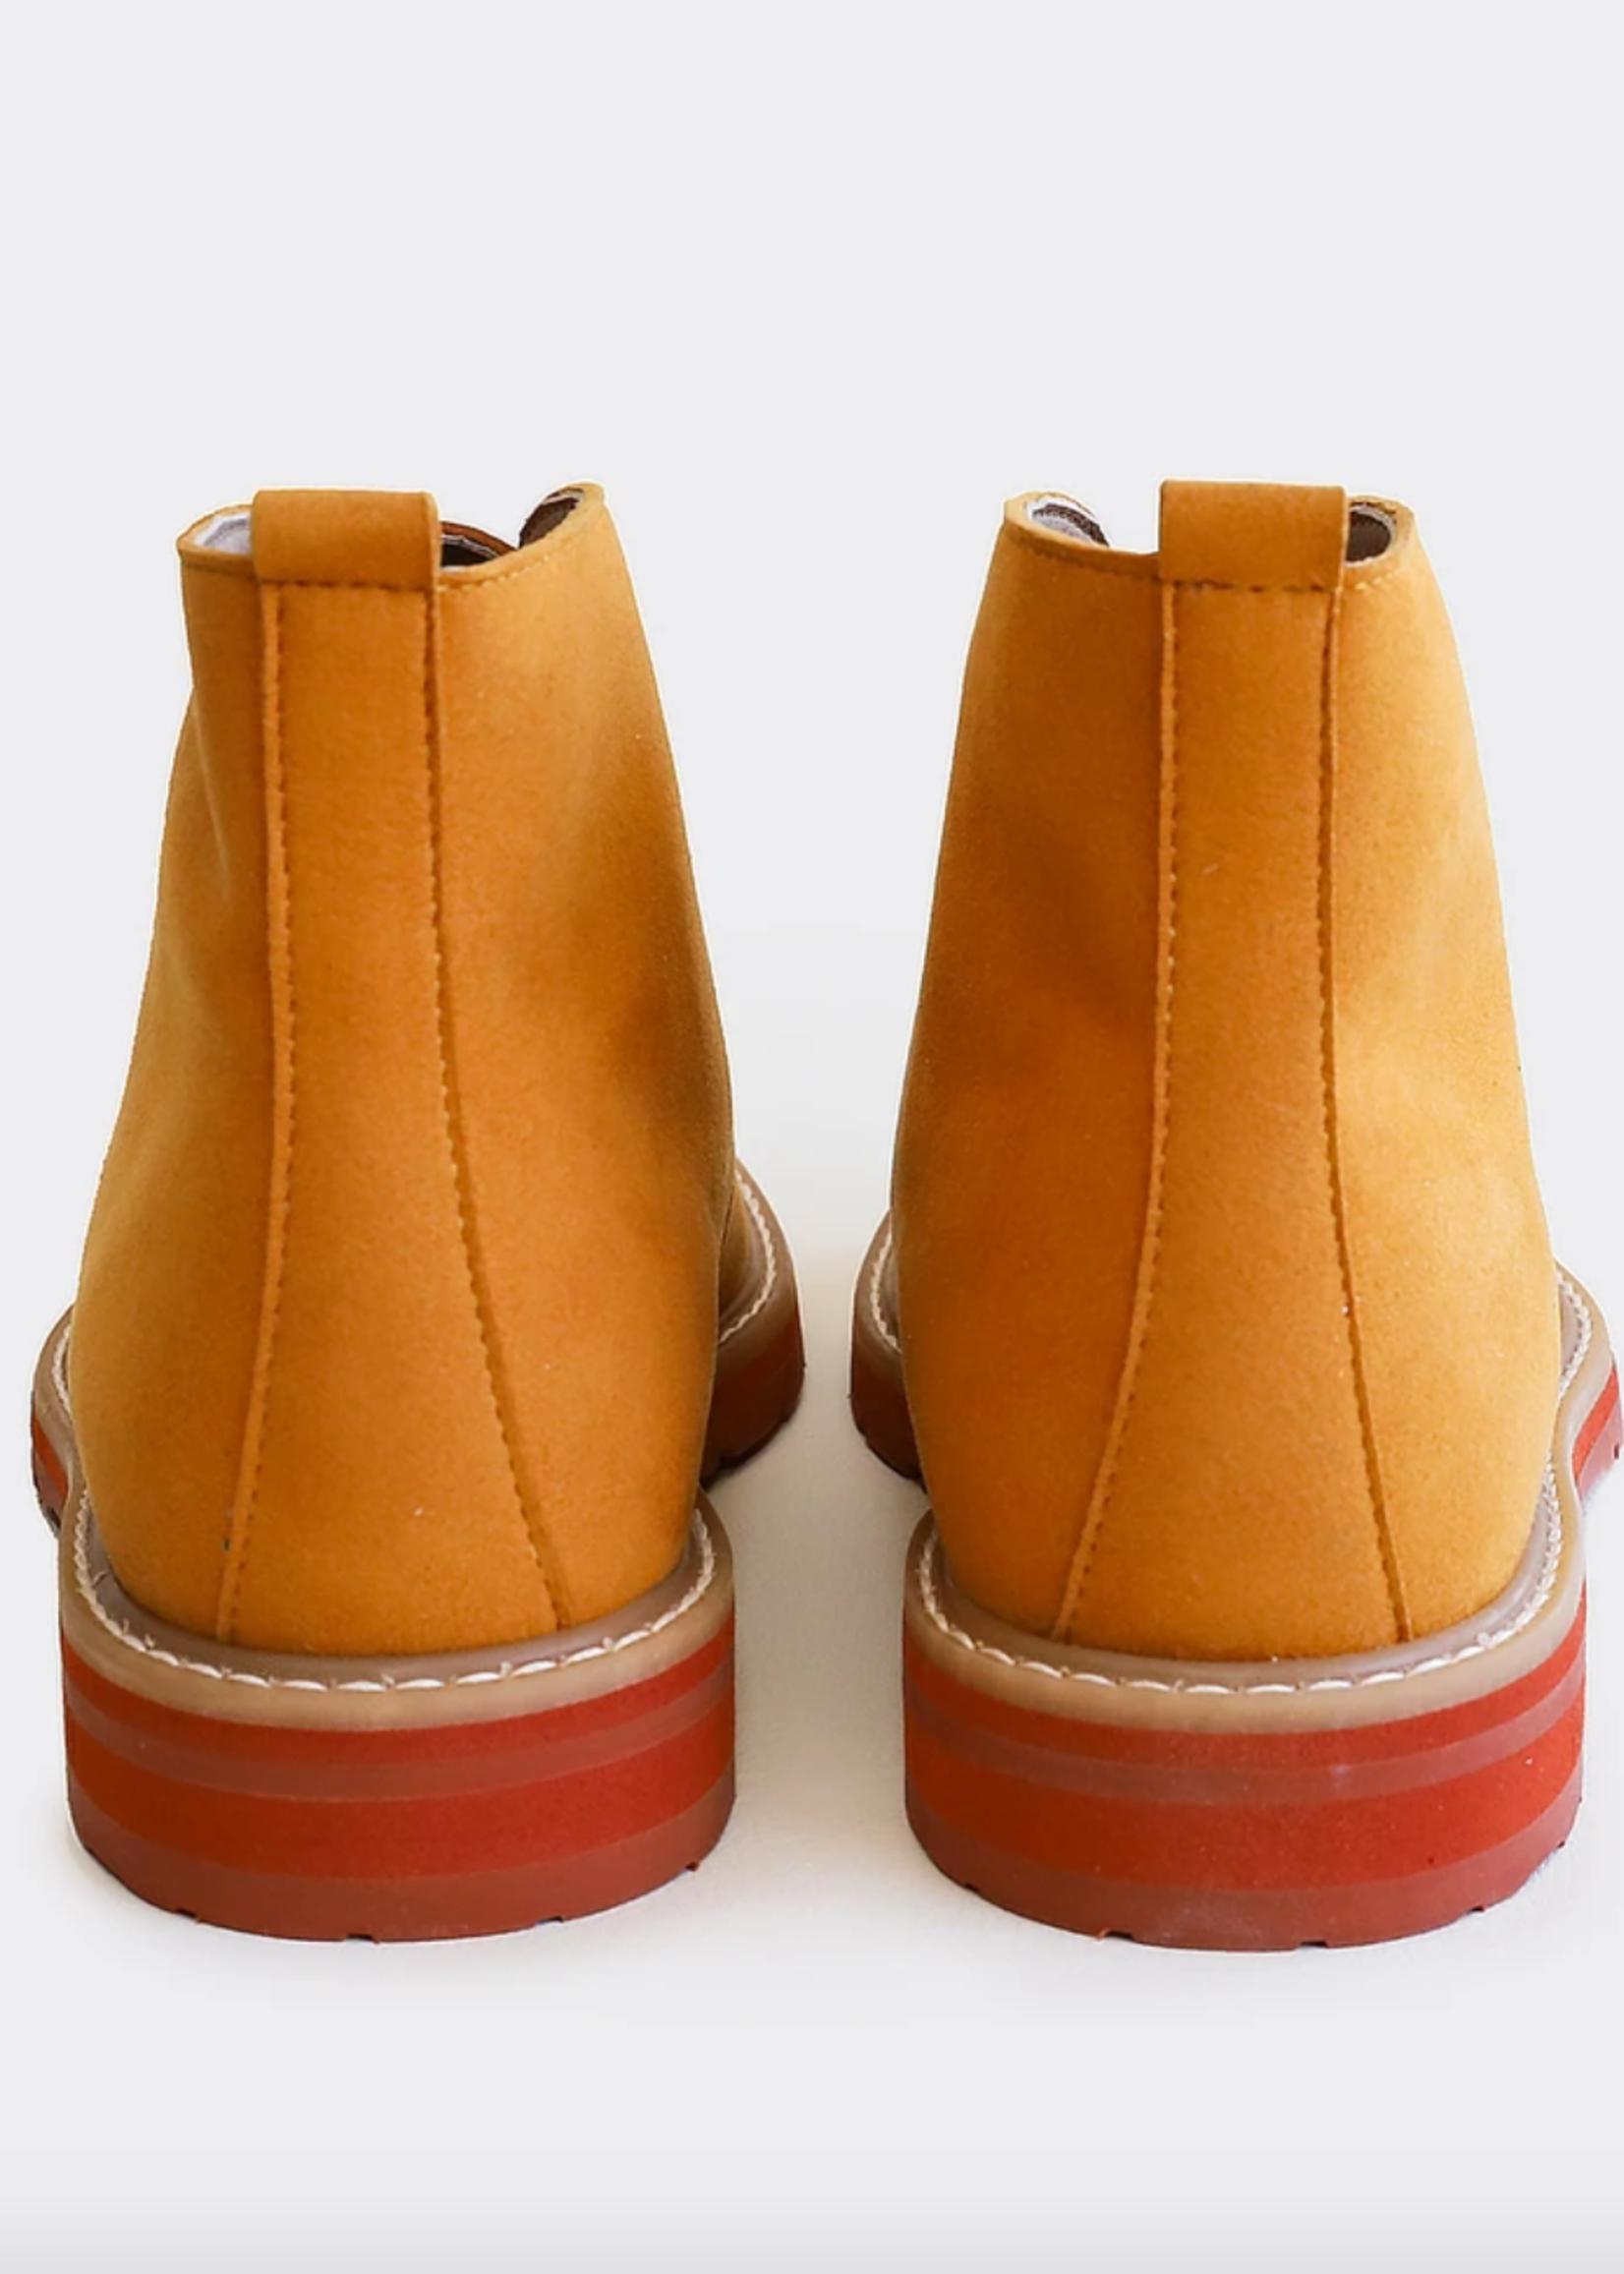 Good Guys Don't Wear Leather Ayita 2.0